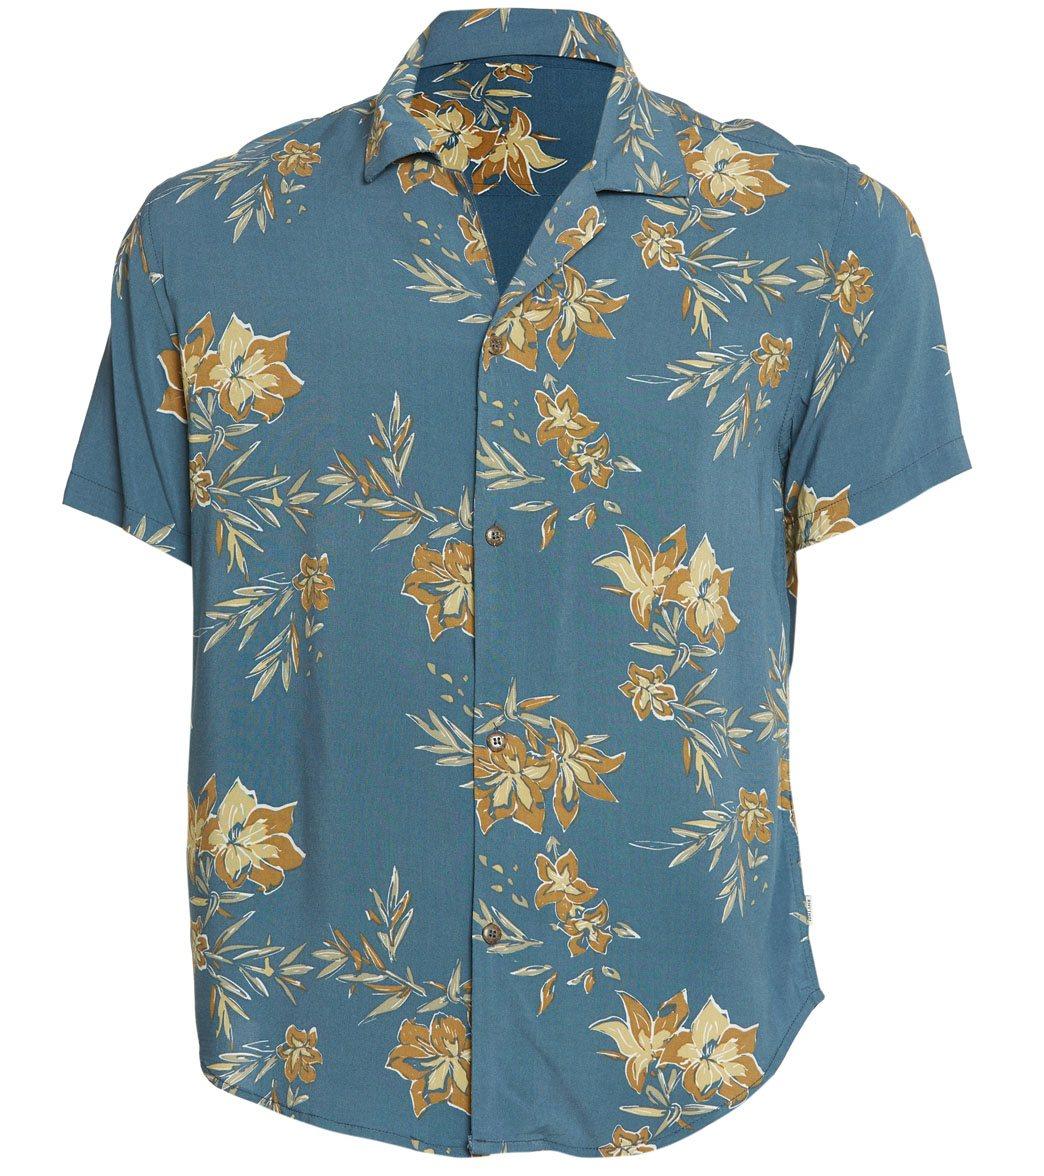 a1a11559584485 Rhythm Vintage Aloha Short Sleeve Shirt at SwimOutlet.com - Free Shipping